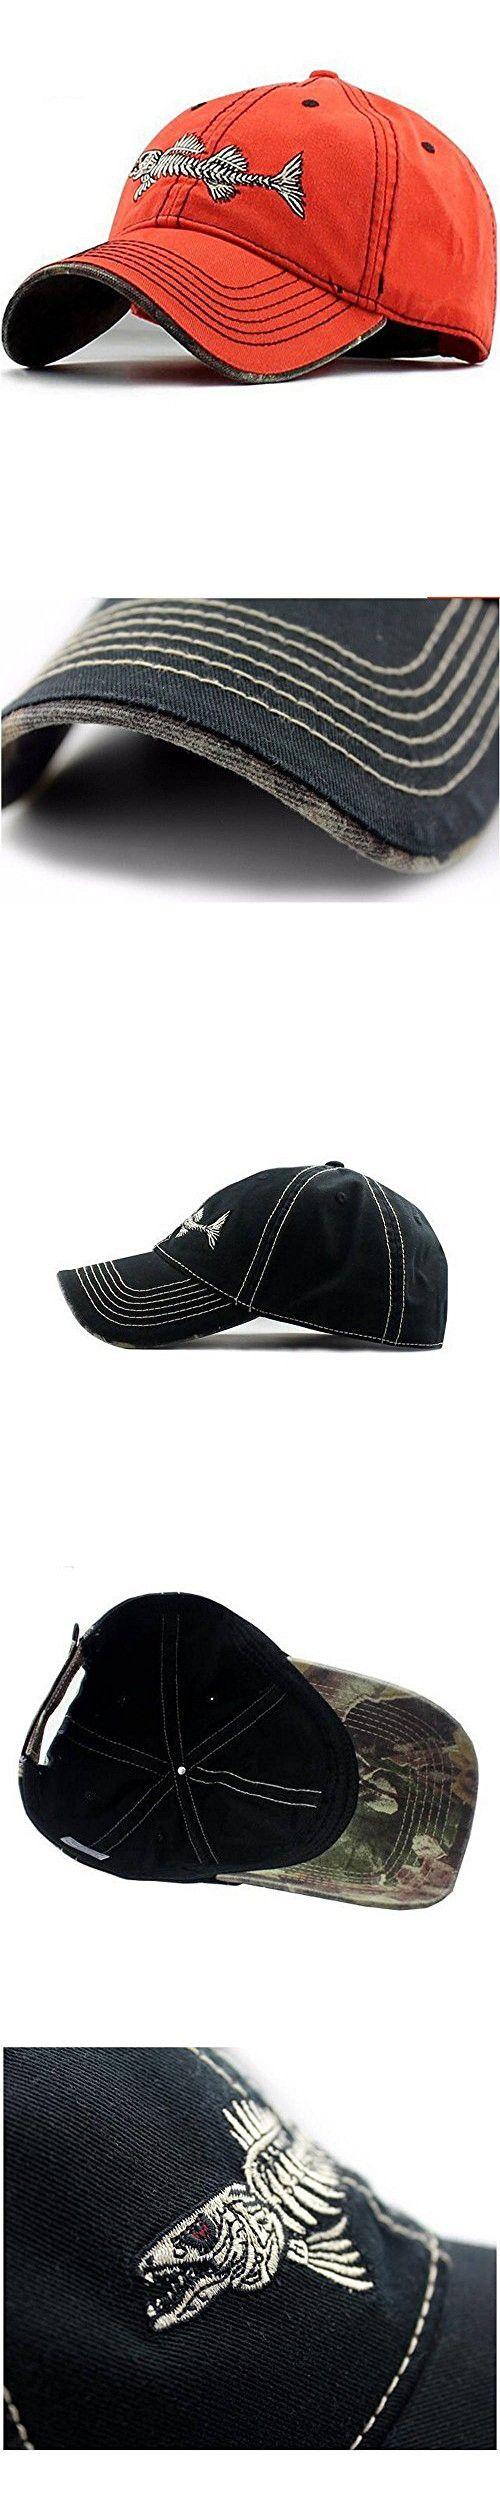 20c5f3ec94415 ... Baseball Caps by Deana Cole. AKIZON Men s Trucker Hat Fishing Style  with Fish bones (Orange)